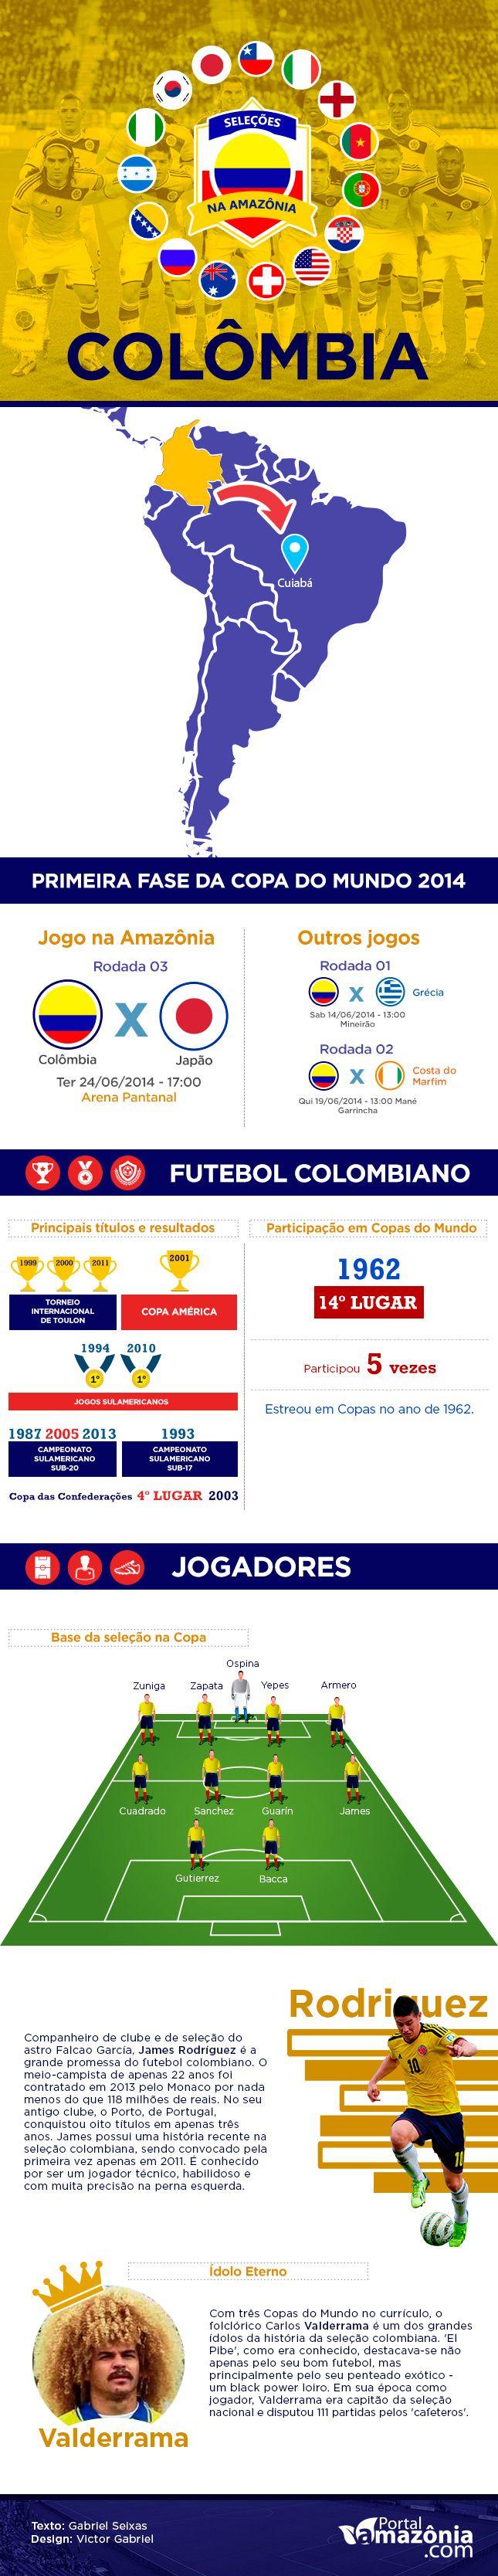 Seleções na Amazônia: Colômbia http://www.portalamazonia.com.br/editoria/esporte/selecoes-na-amazonia-colombia/